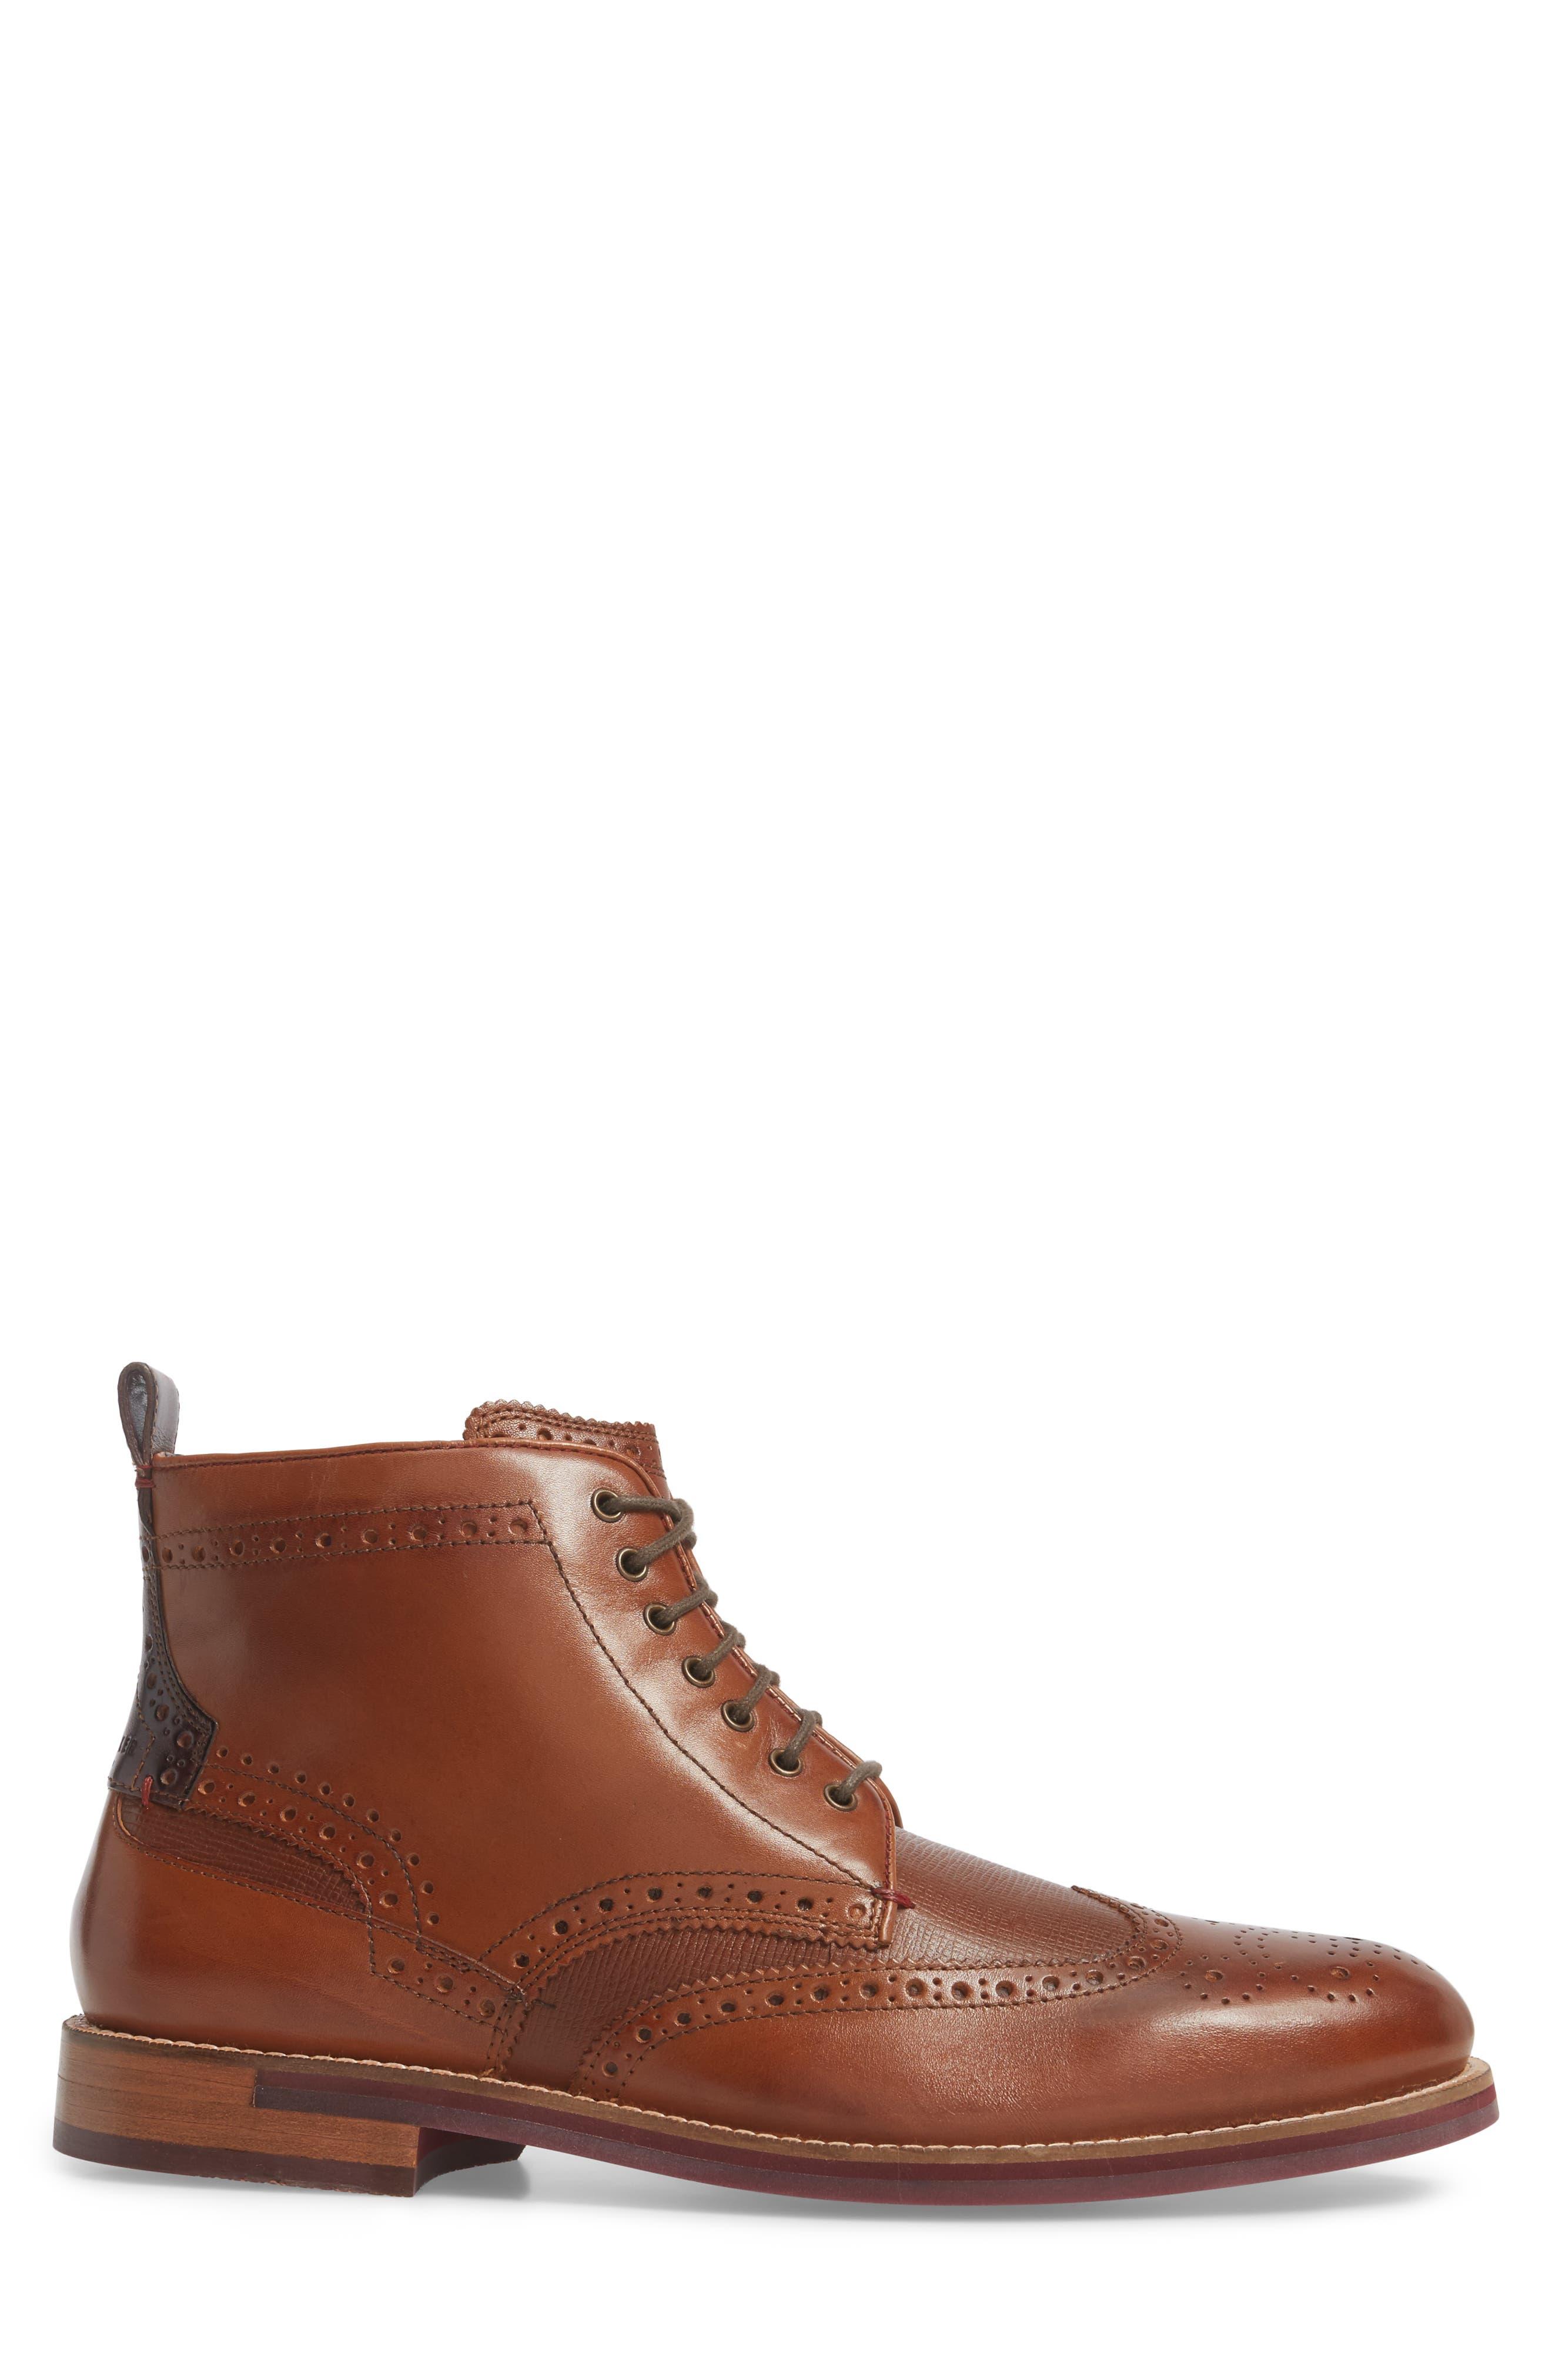 Hjenno Wingtip Boot,                             Alternate thumbnail 3, color,                             Tan Leather